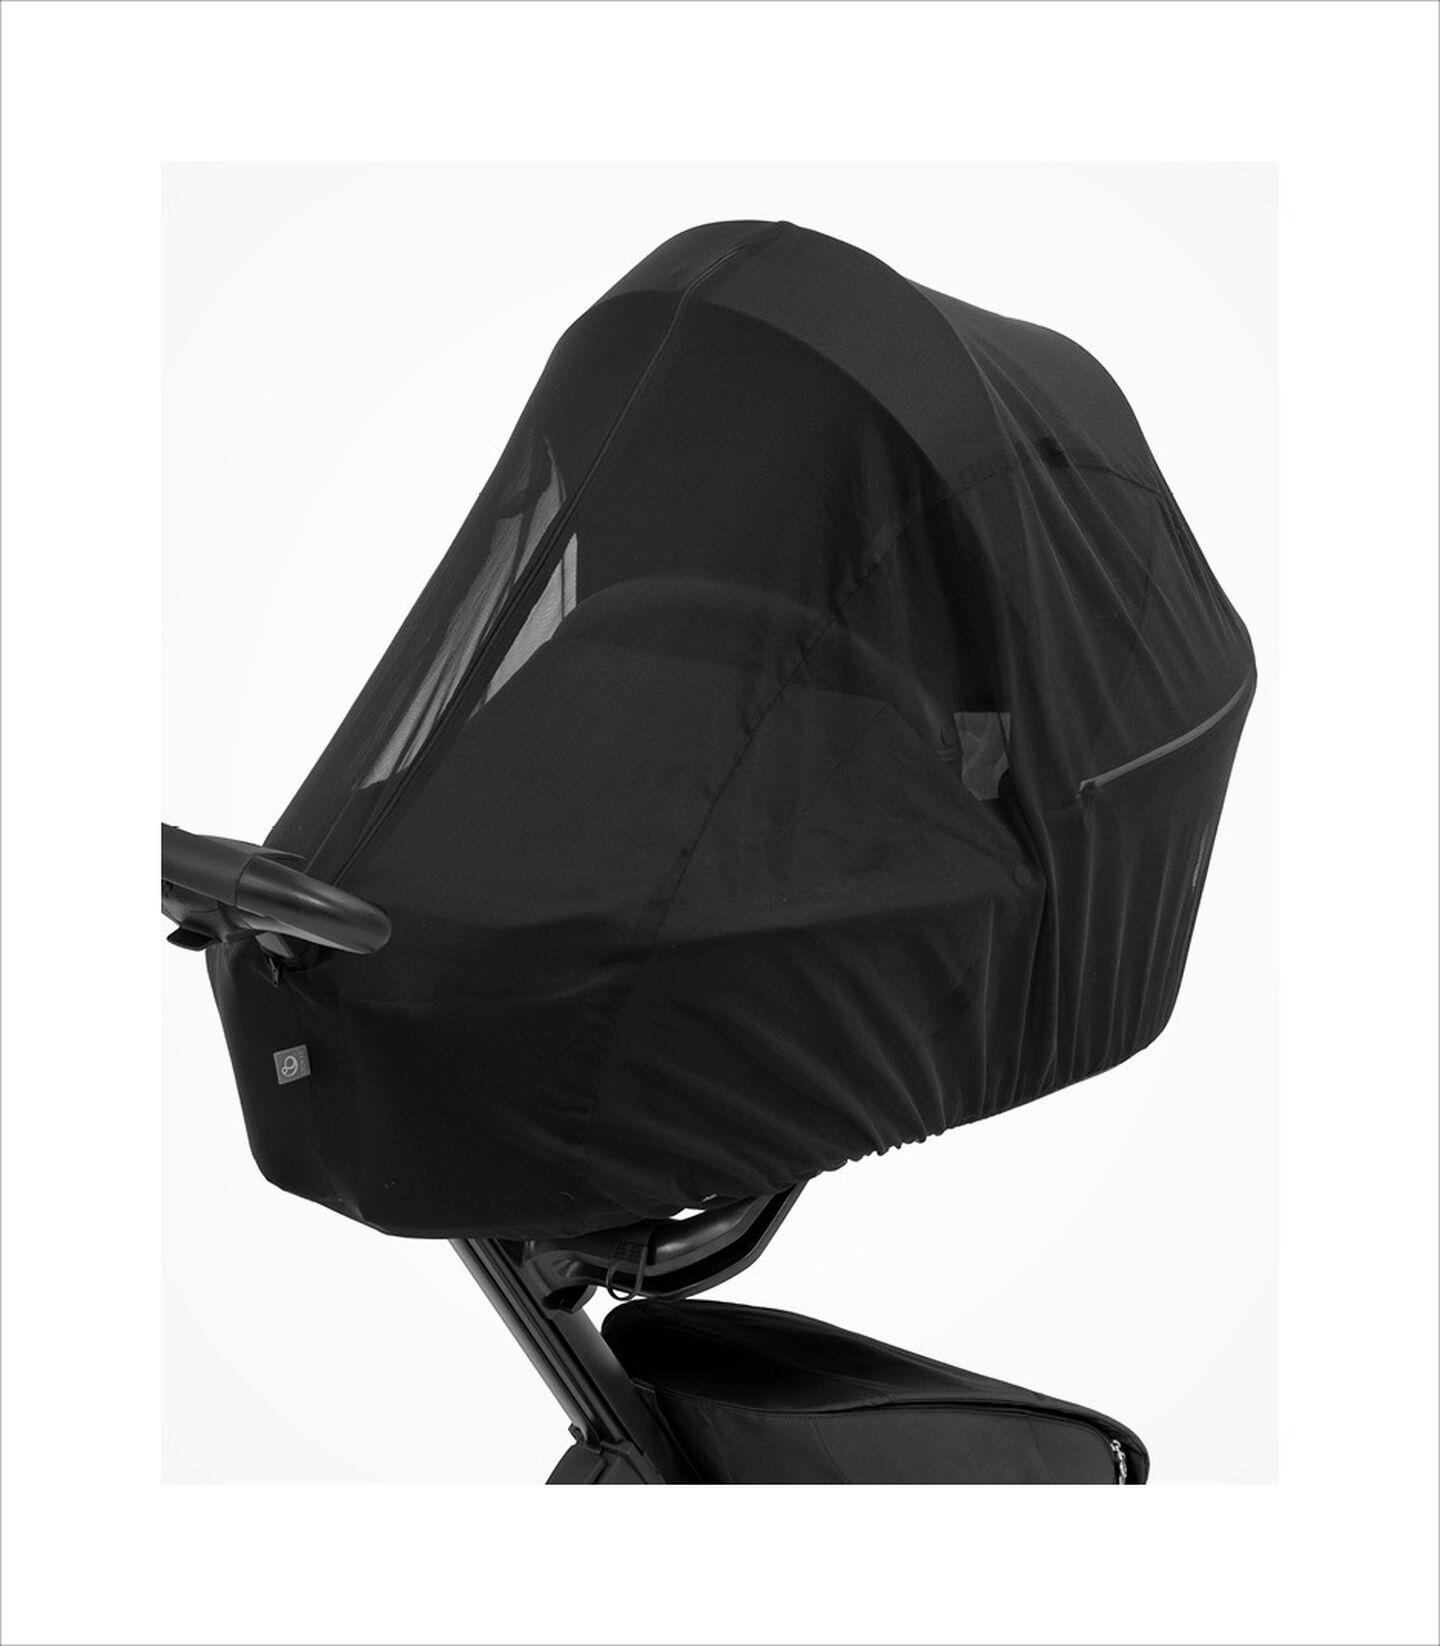 Stokke® Xplory® X Moskitonetz Black, Black, mainview view 3